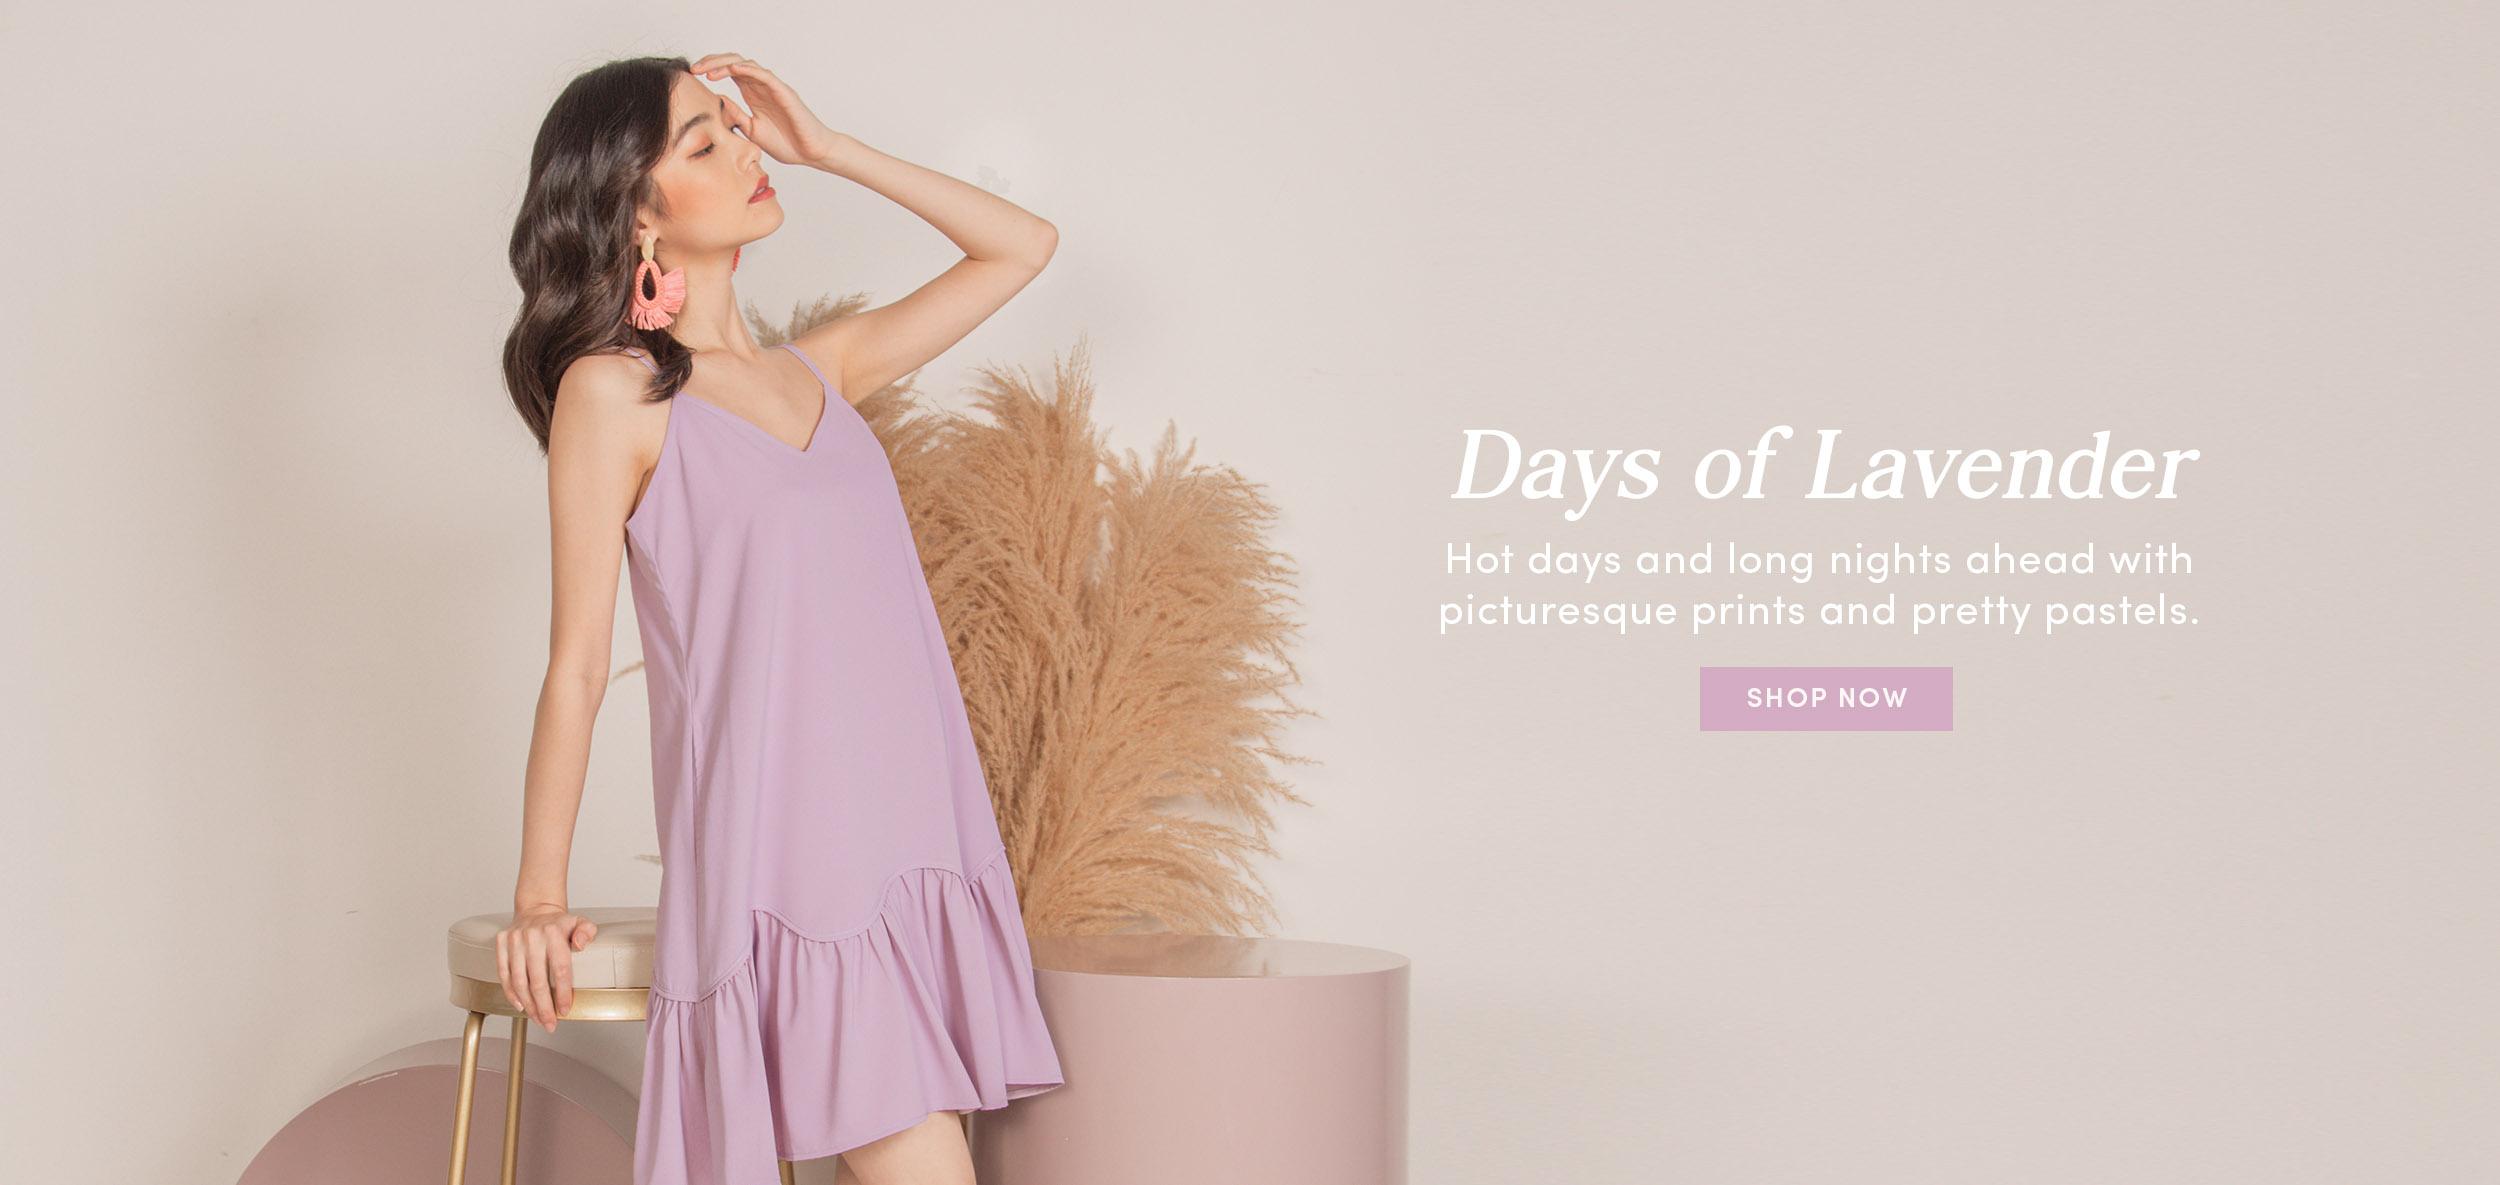 Days of Lavender